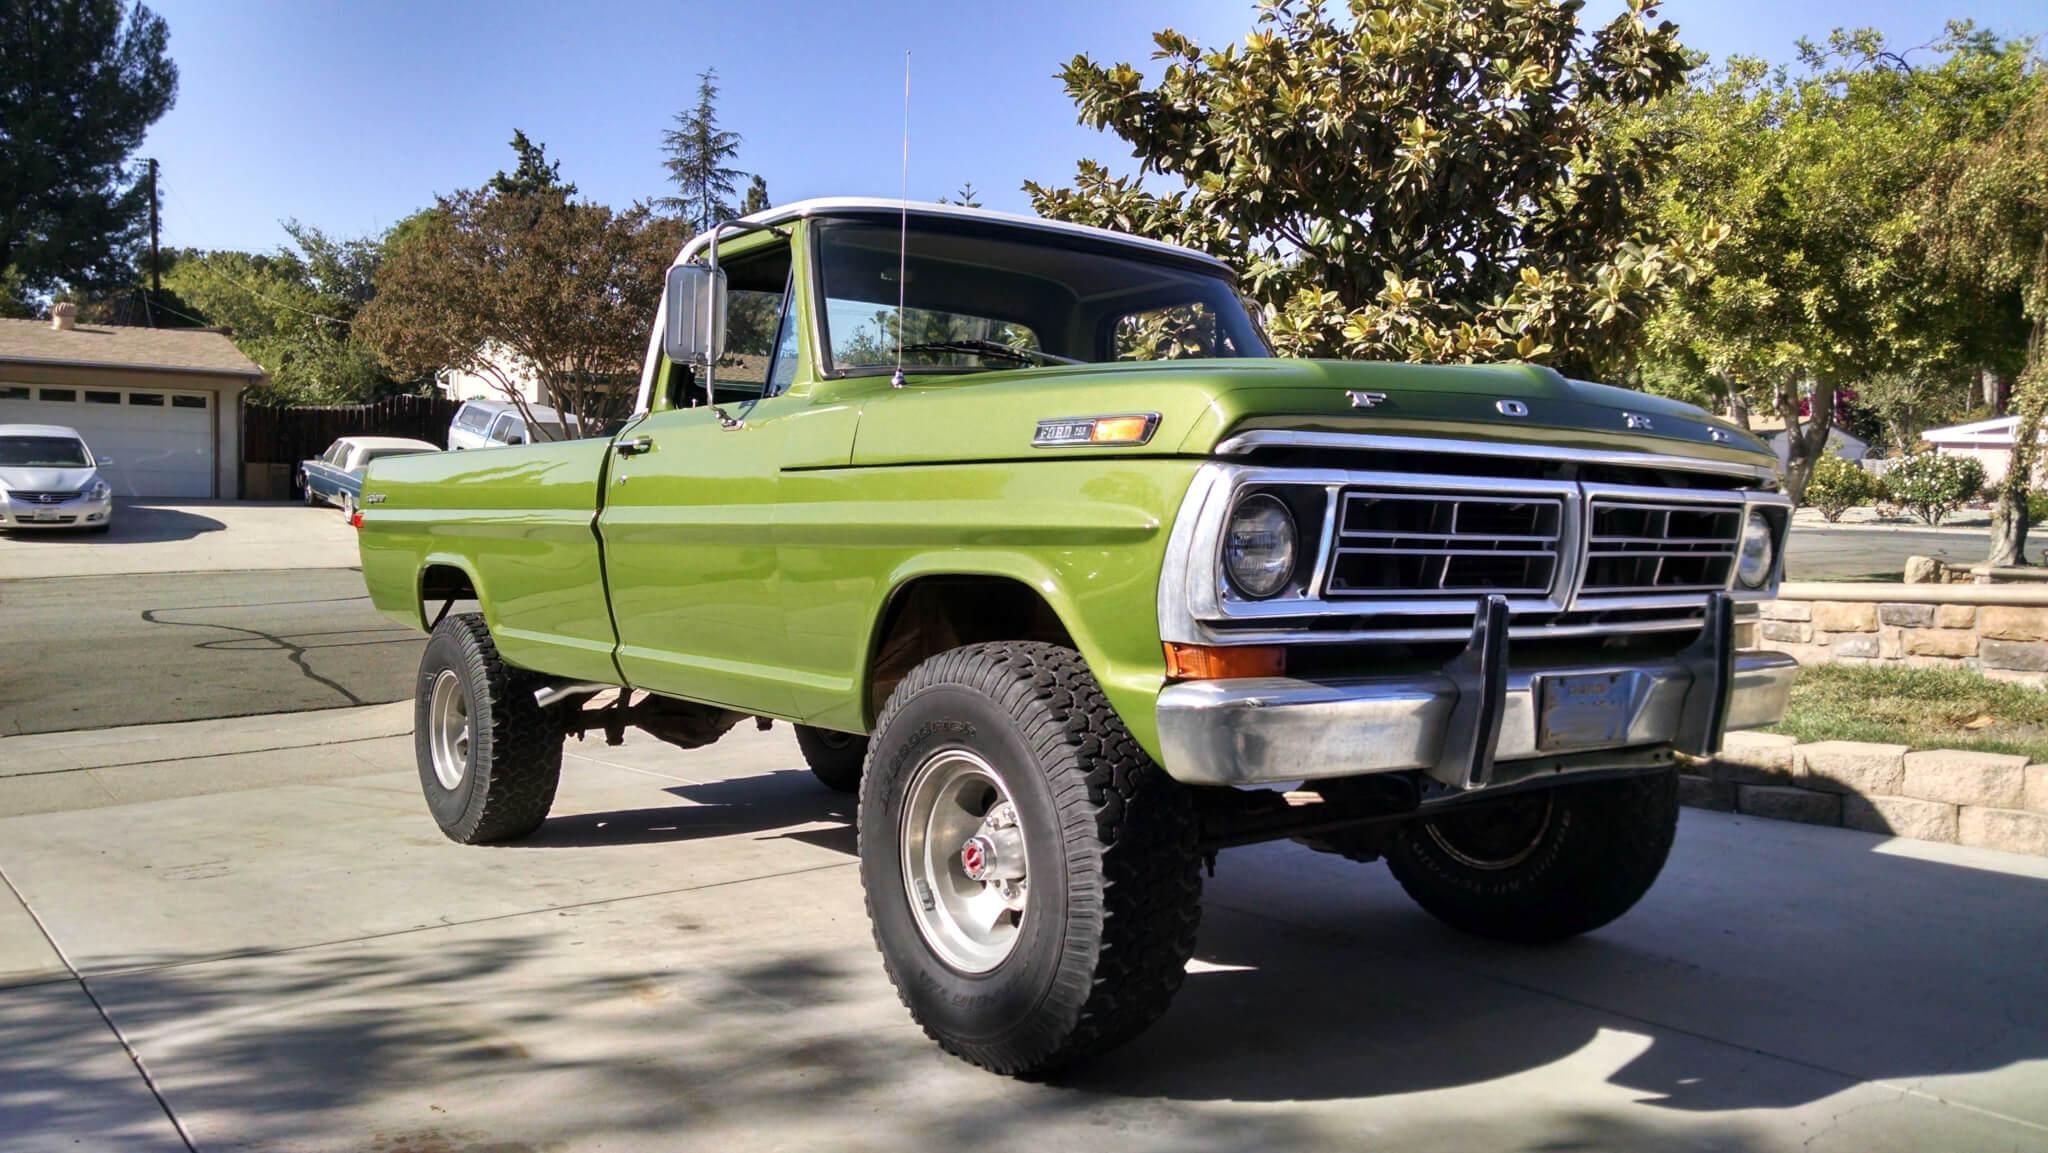 1972 Ford F250 Erick D LMC Truck Life